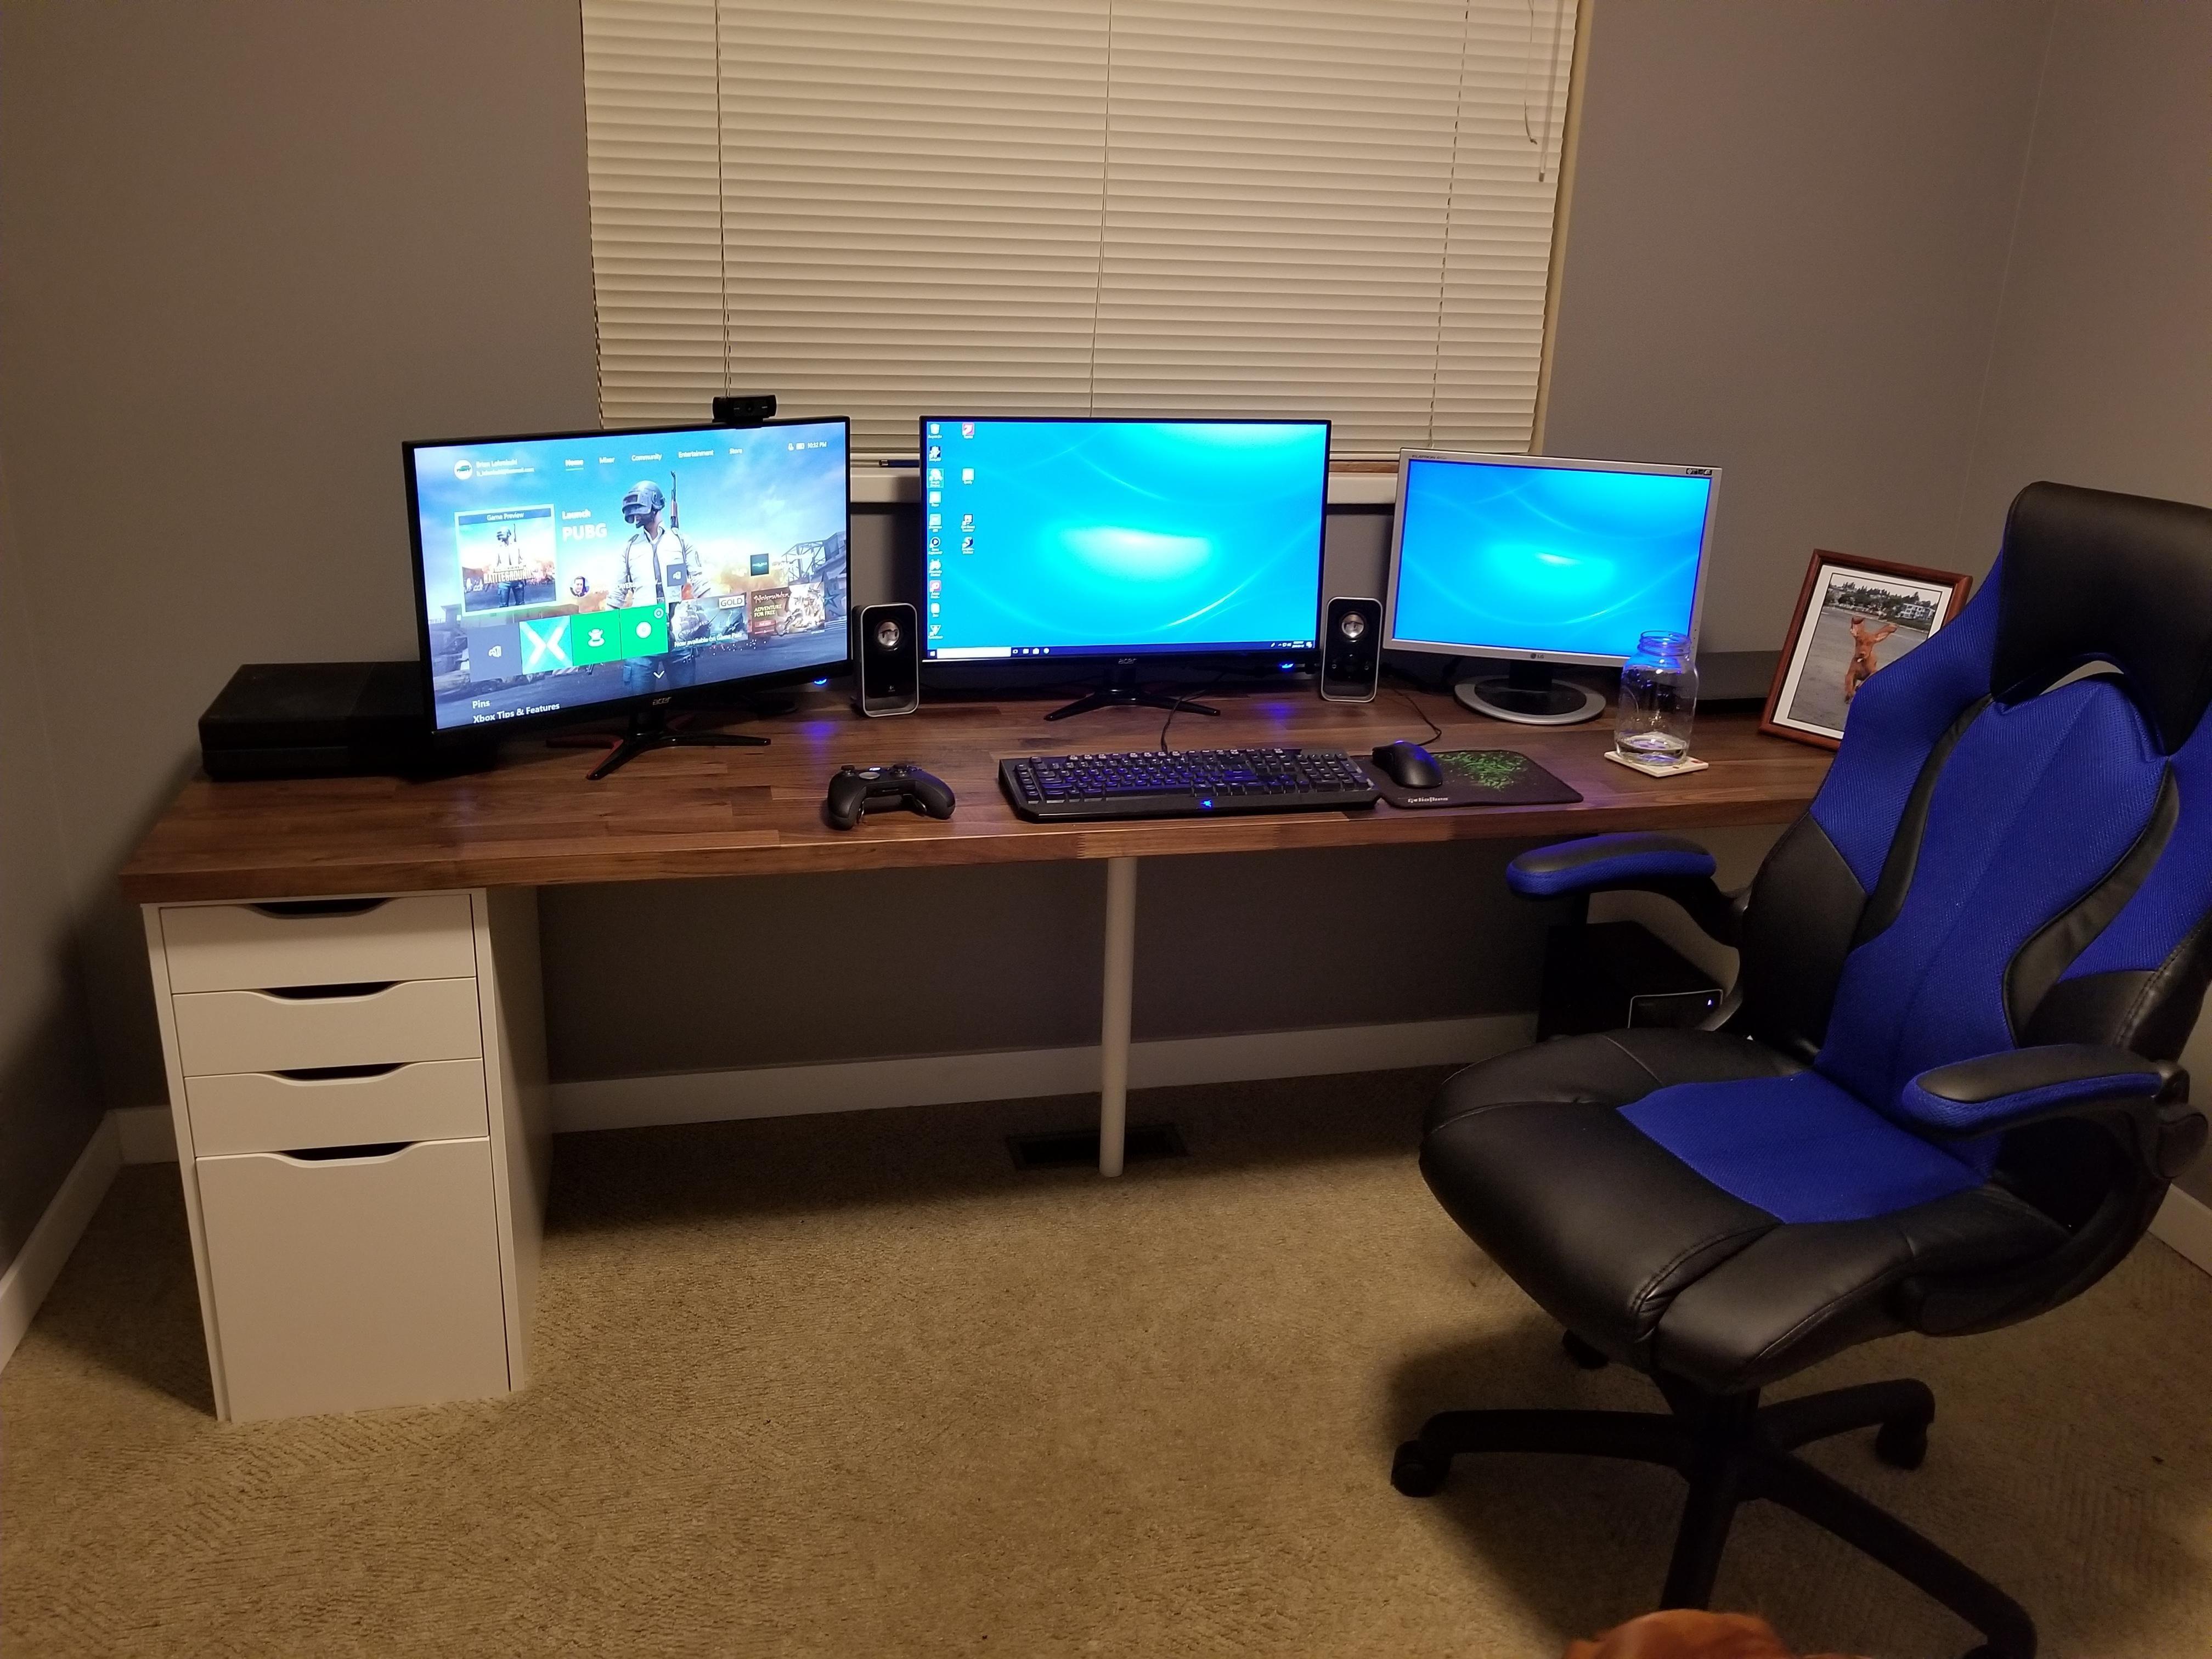 FOLLOW setup_hd FOR DAILY PC SETUPS!!! . DM me if you